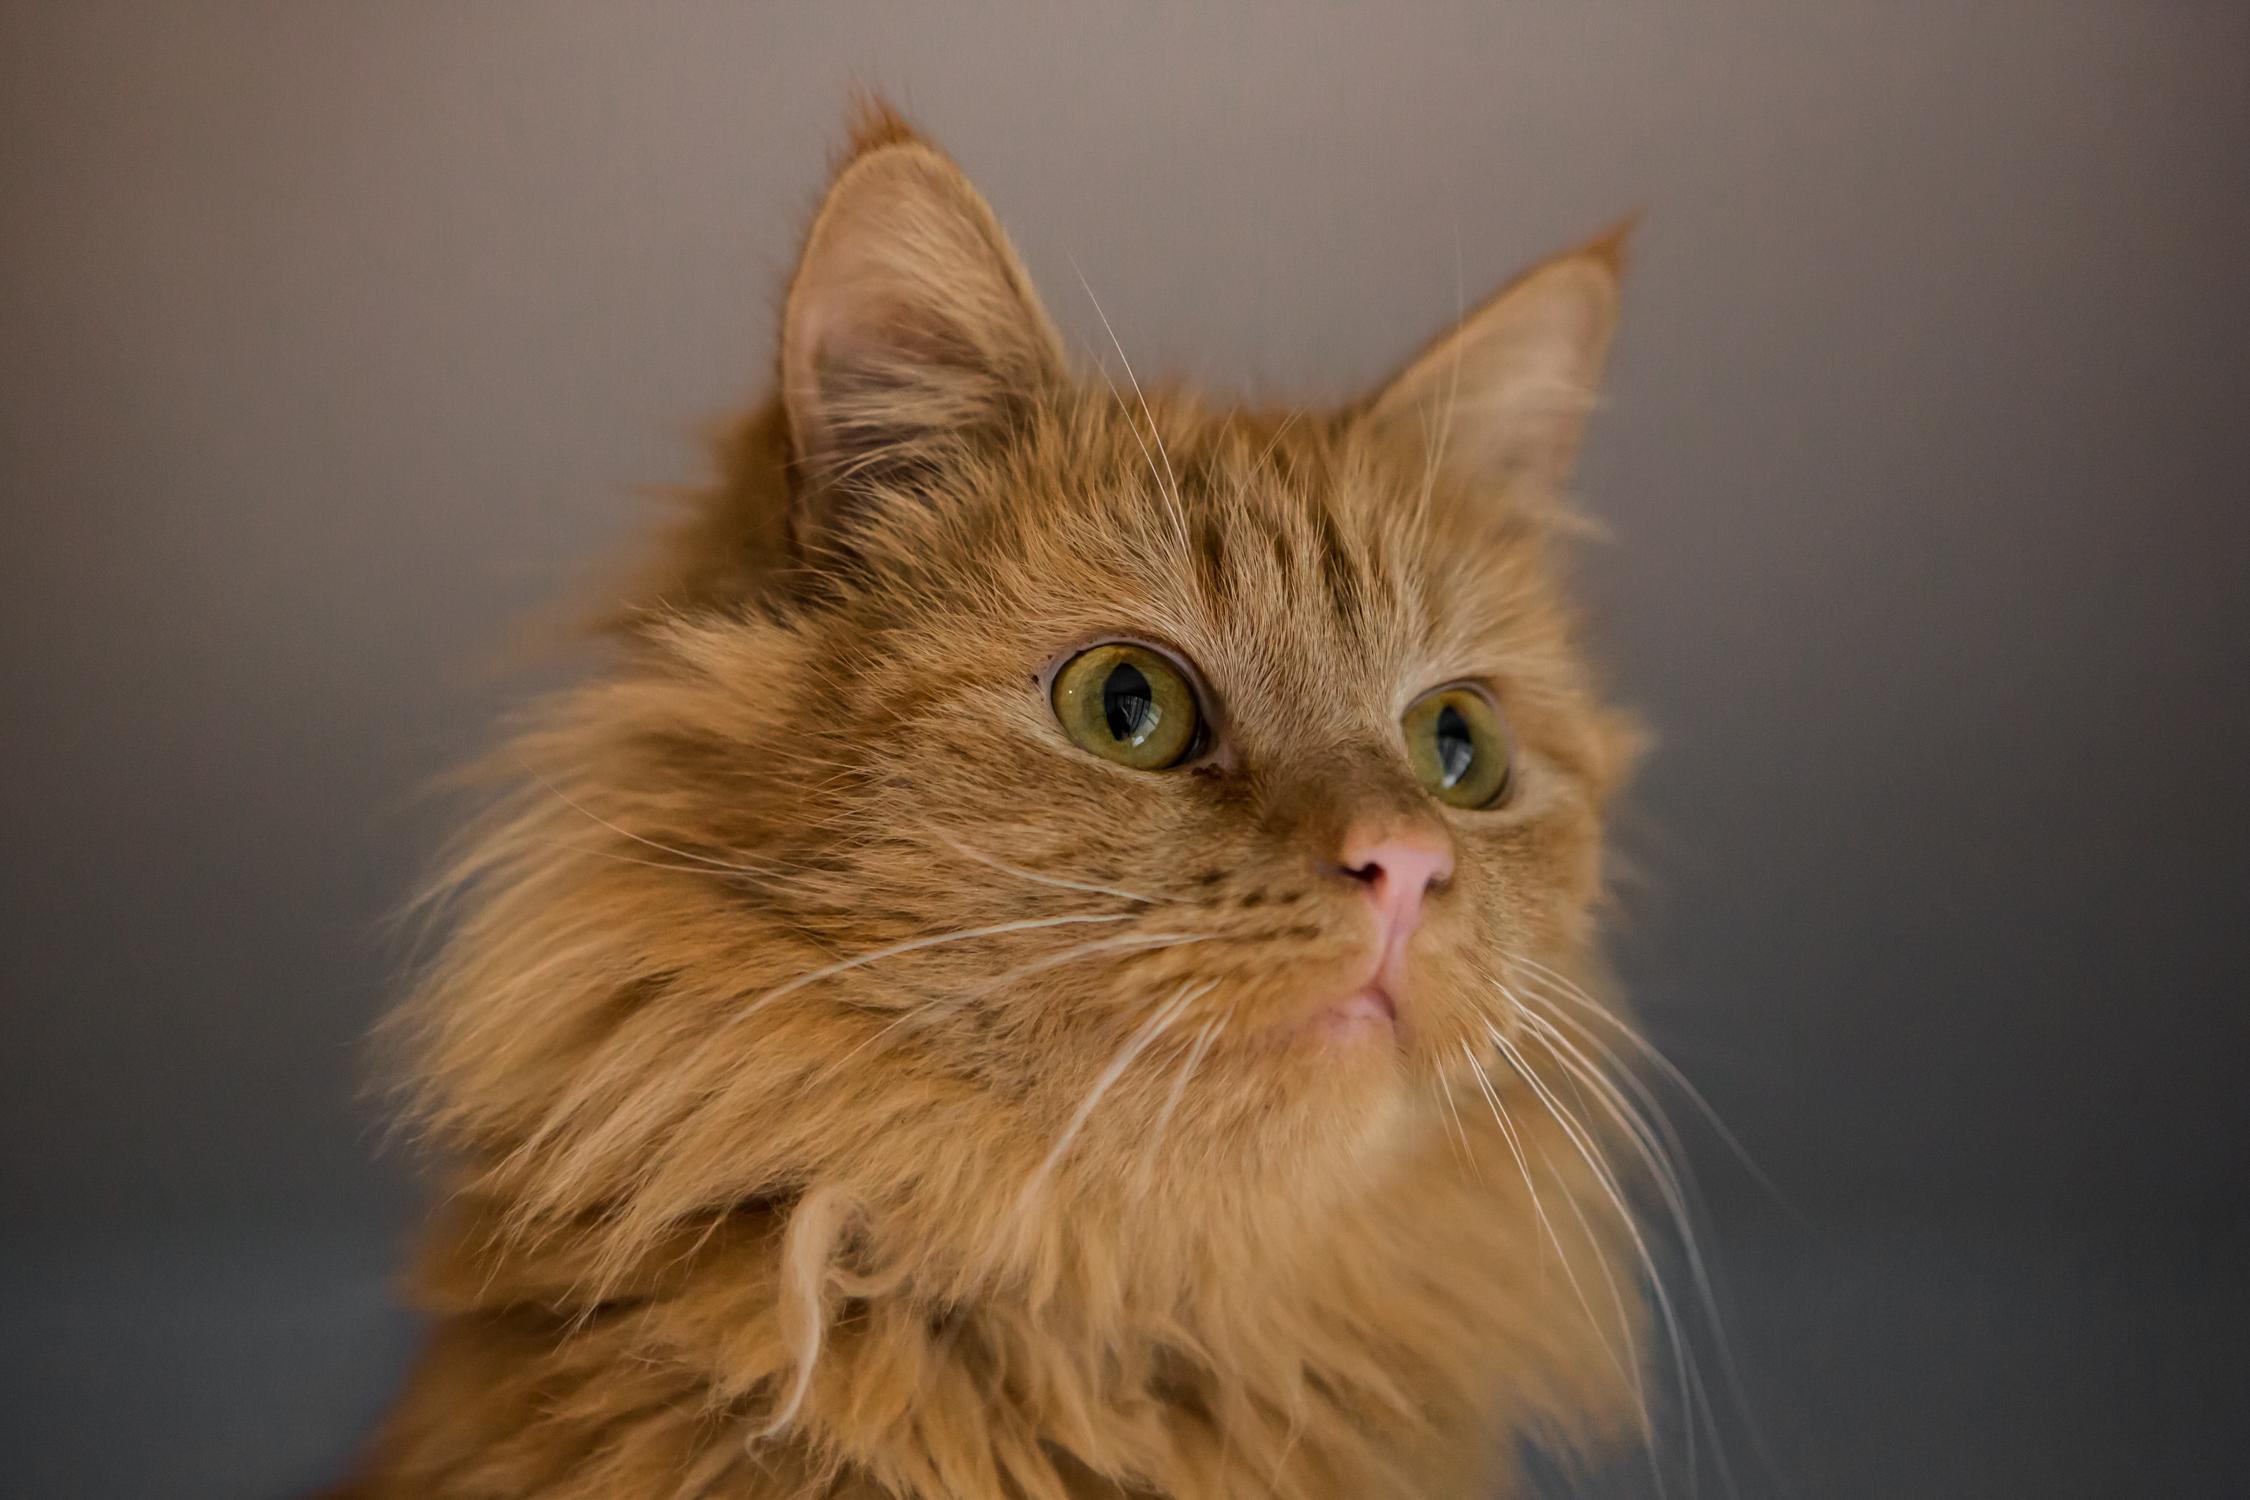 KW_Cats1_013.jpg